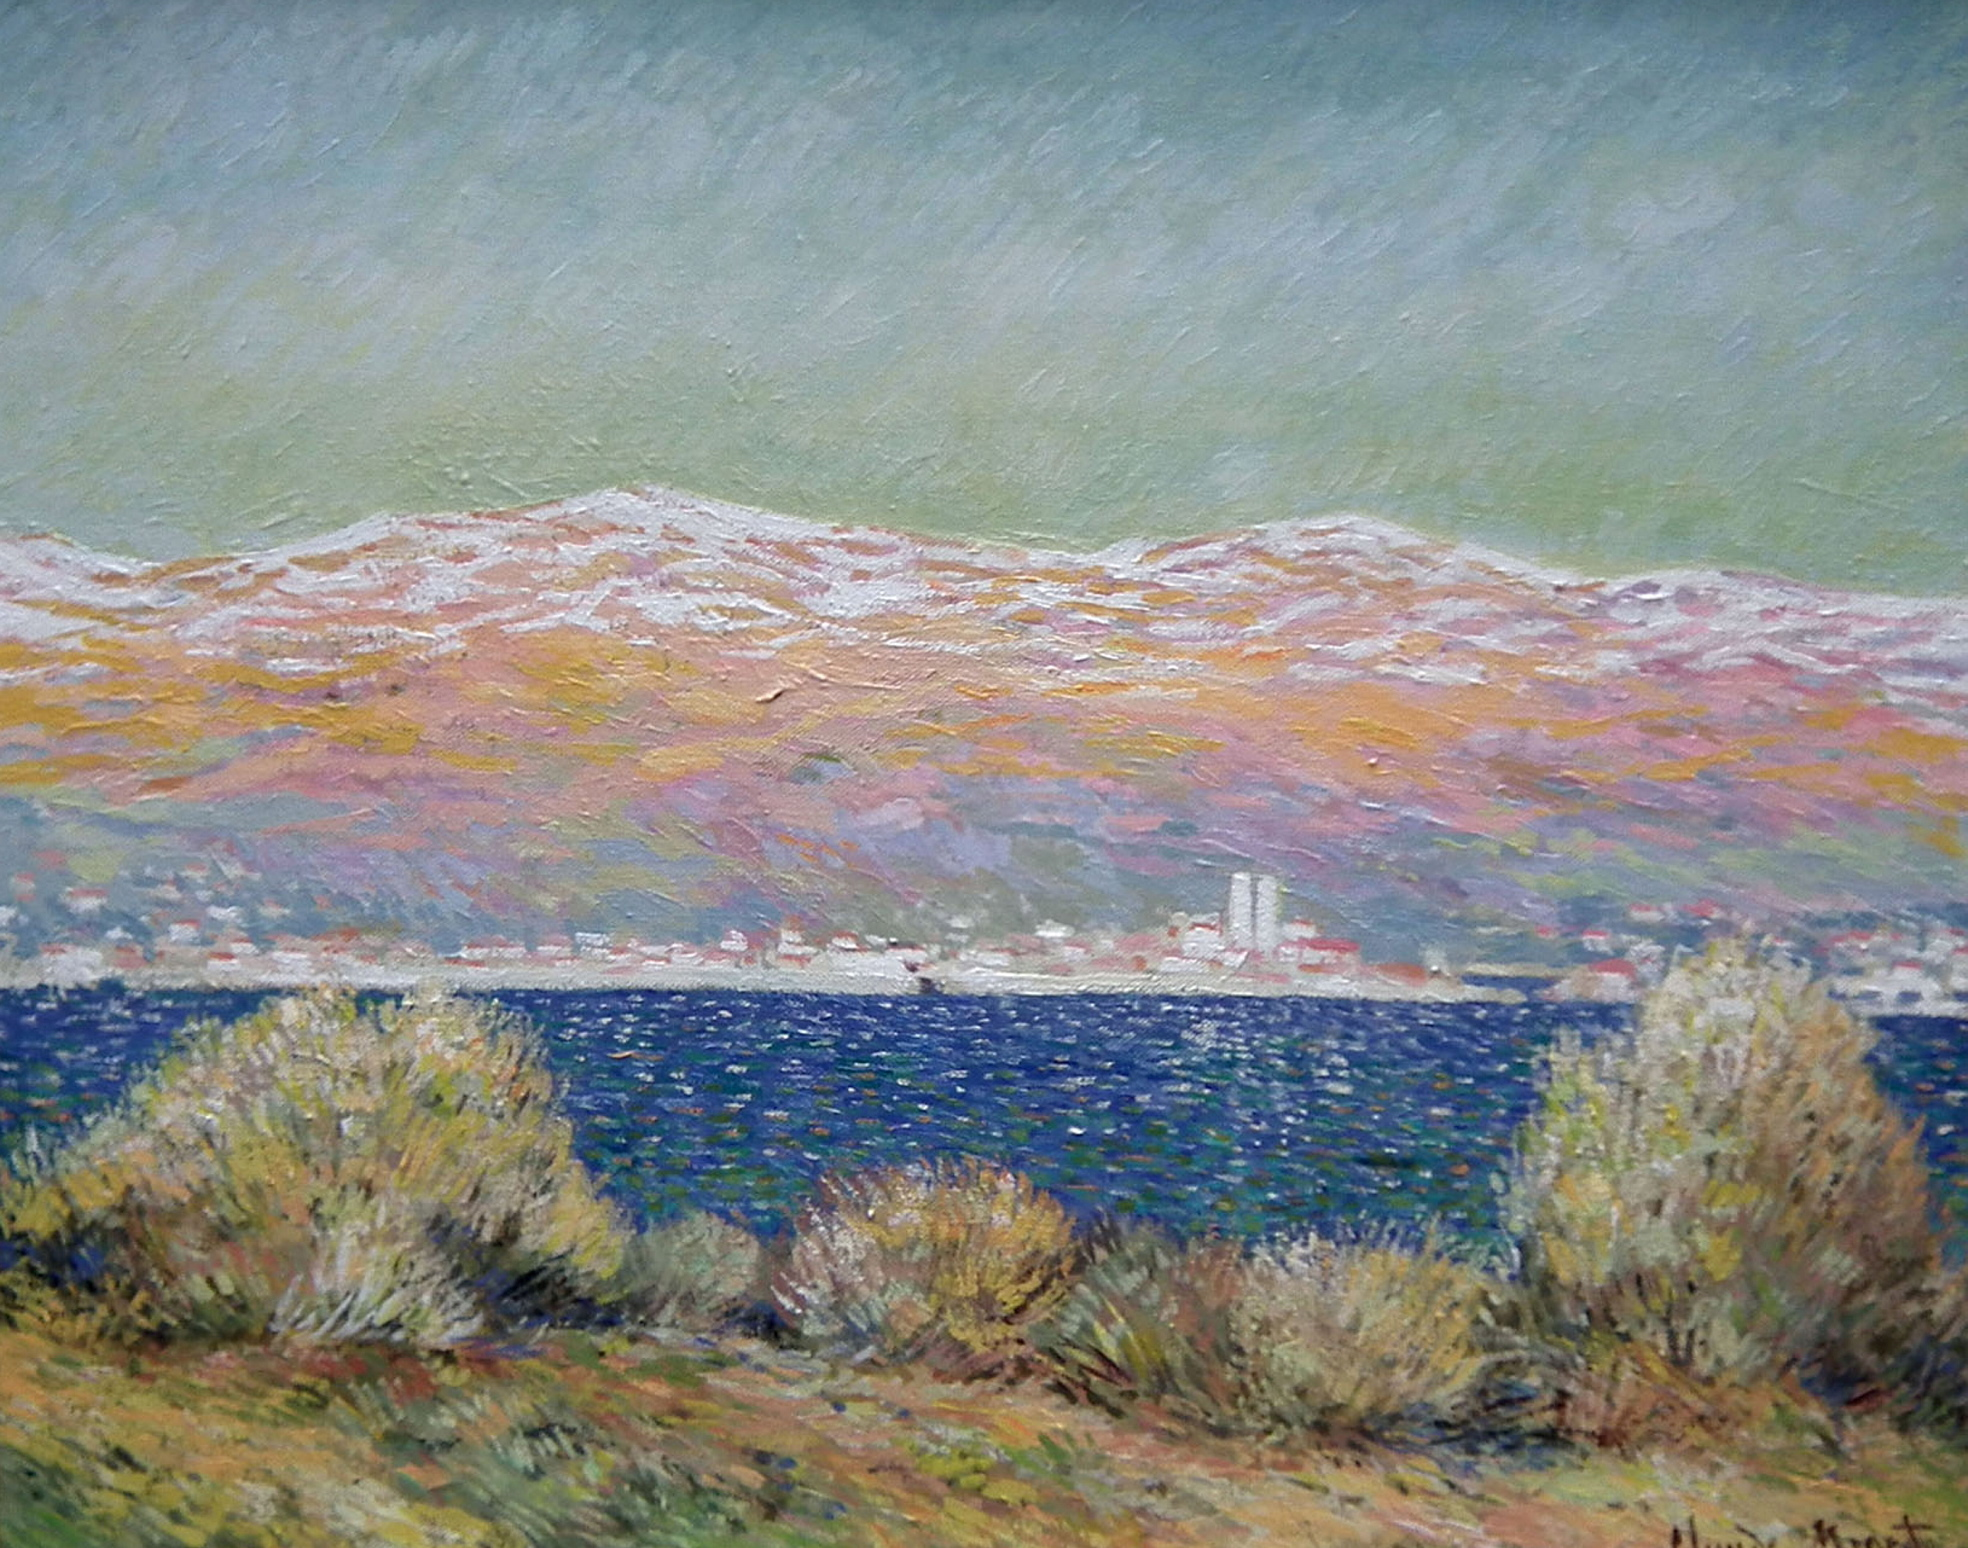 Artist John Myatt's View of Antibes (Morning Effect) in the style of Claude Monet.